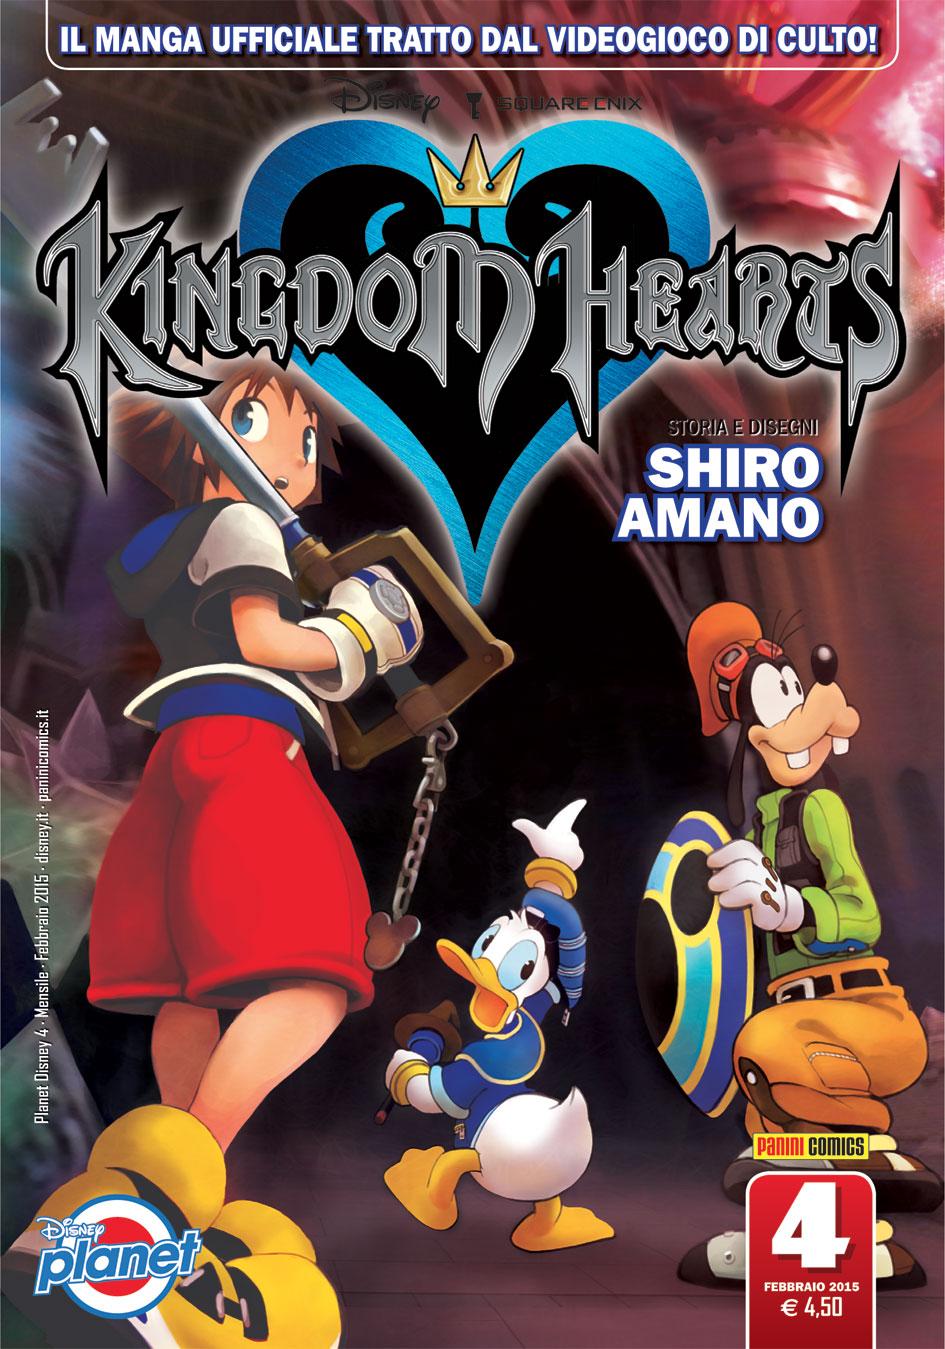 Cover Disney Planet 4 - Kingdom Hearts 4